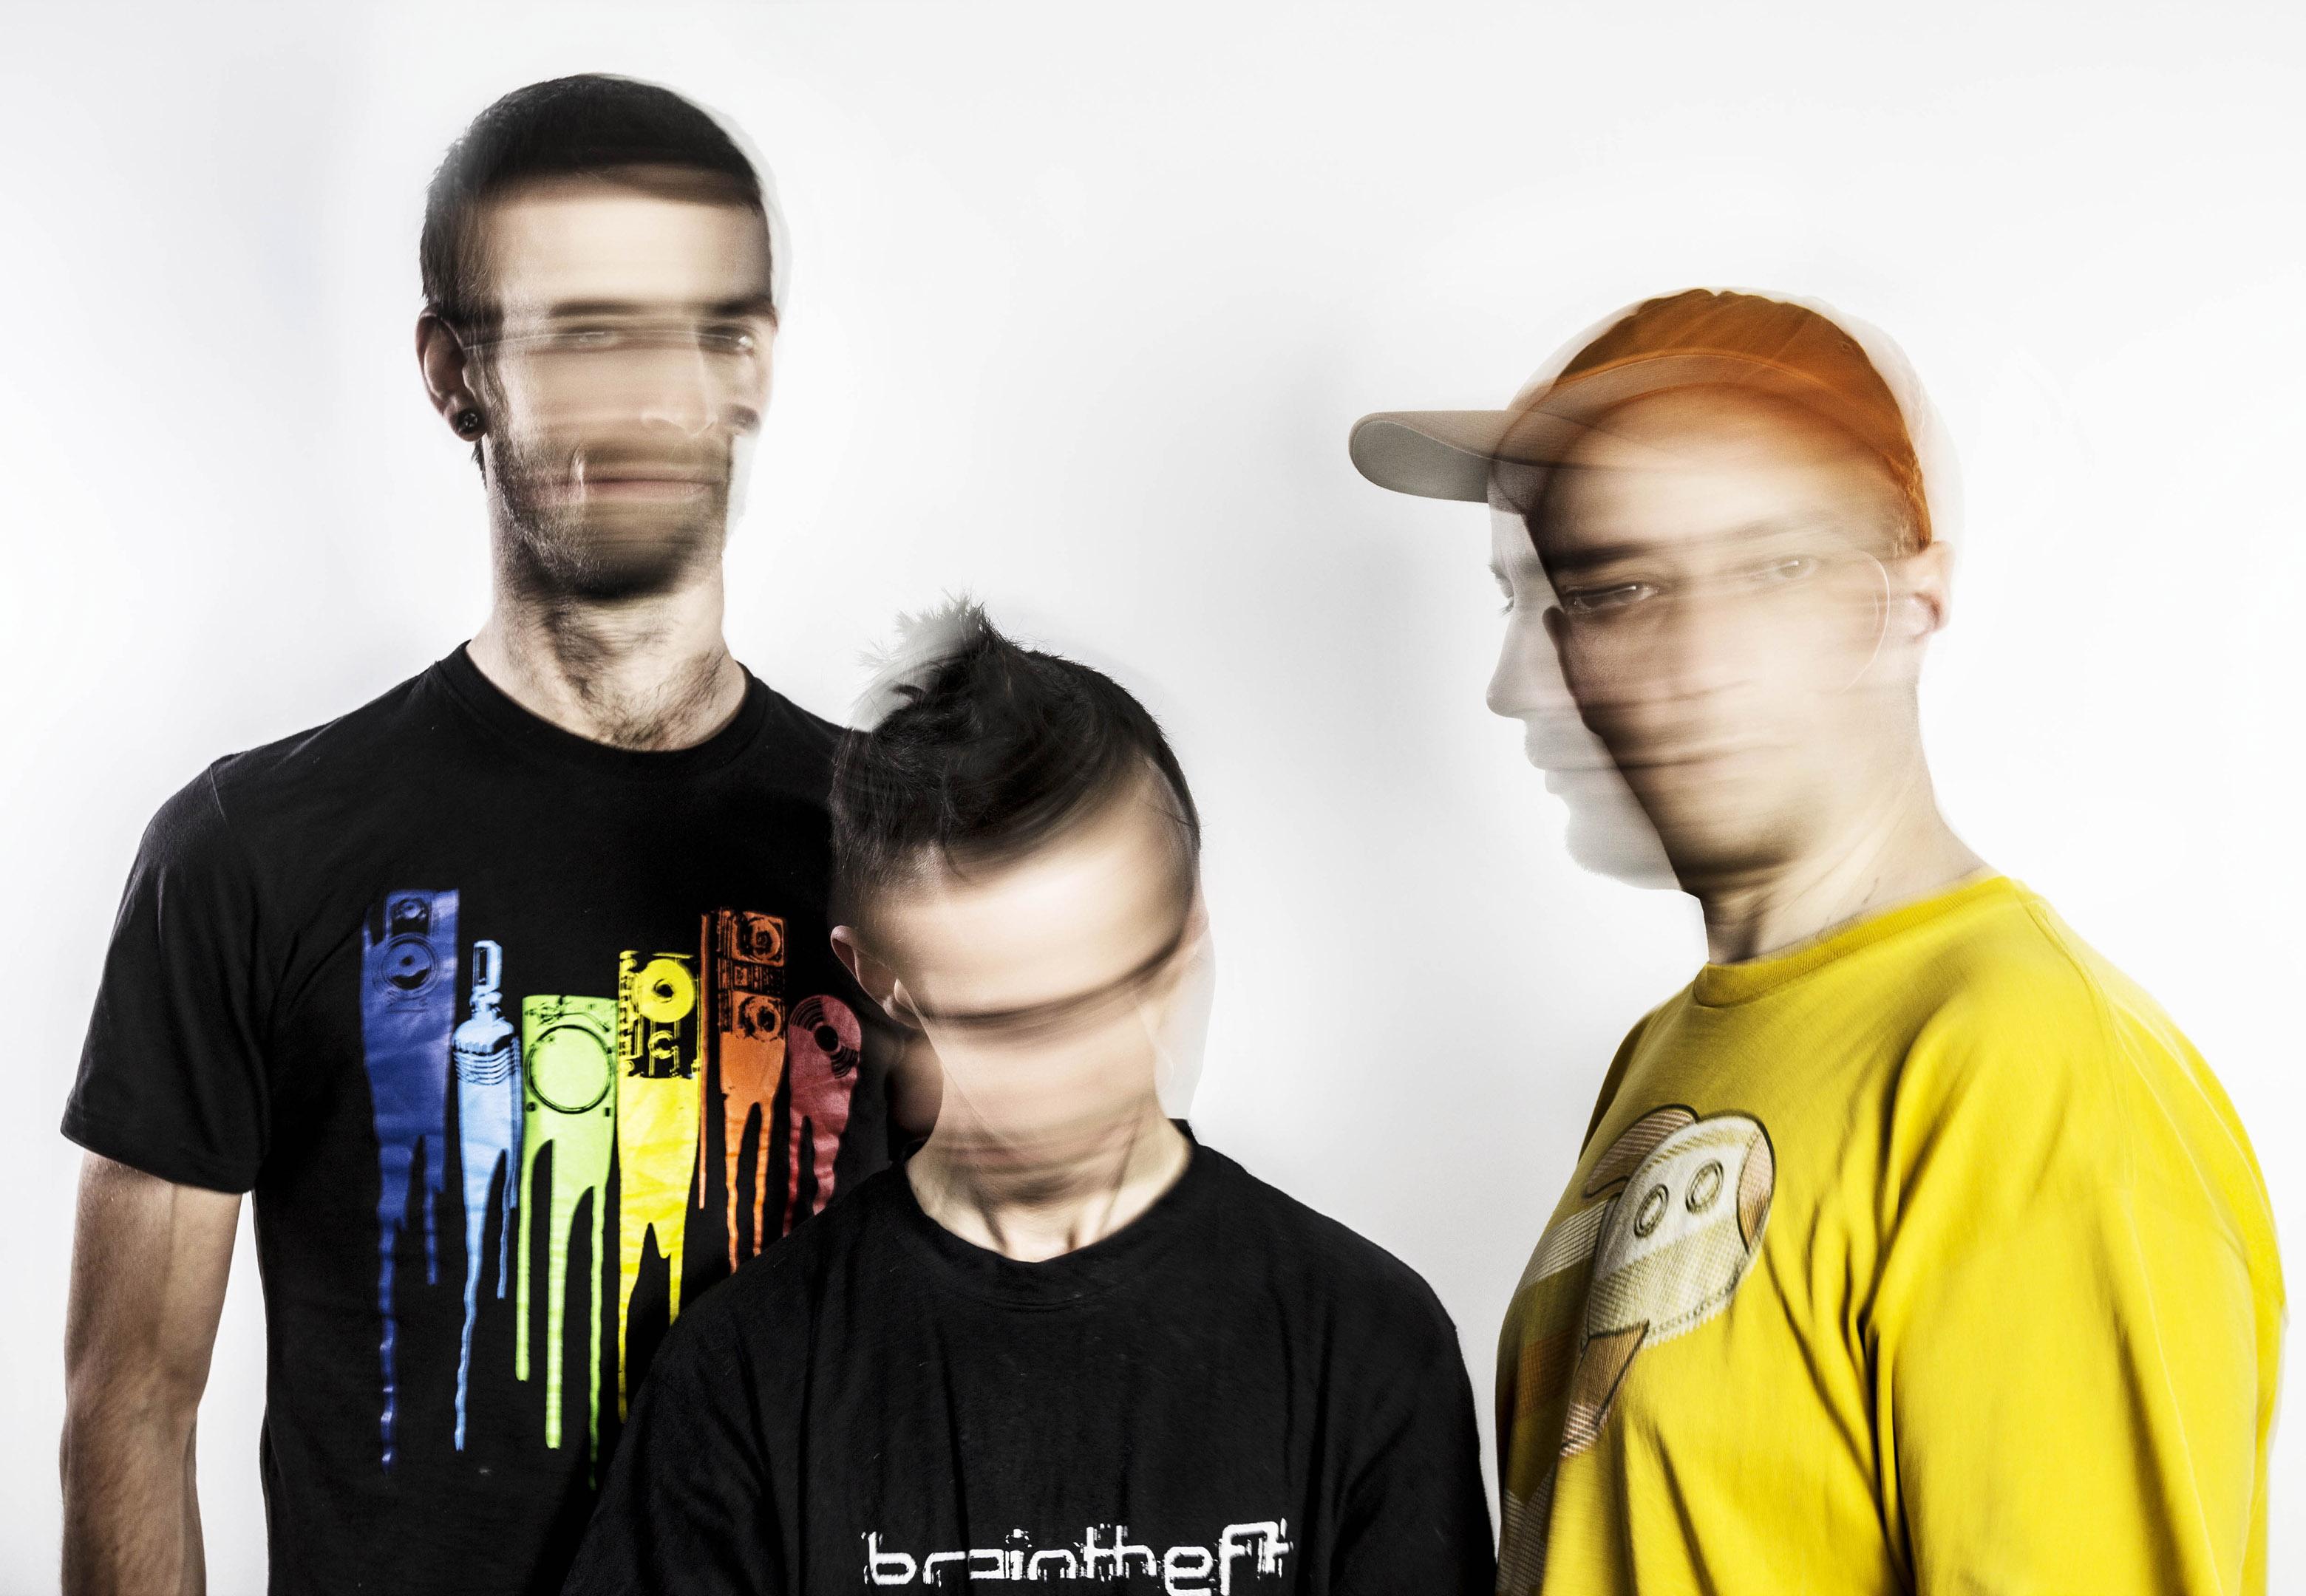 Preview: Braintheft Night